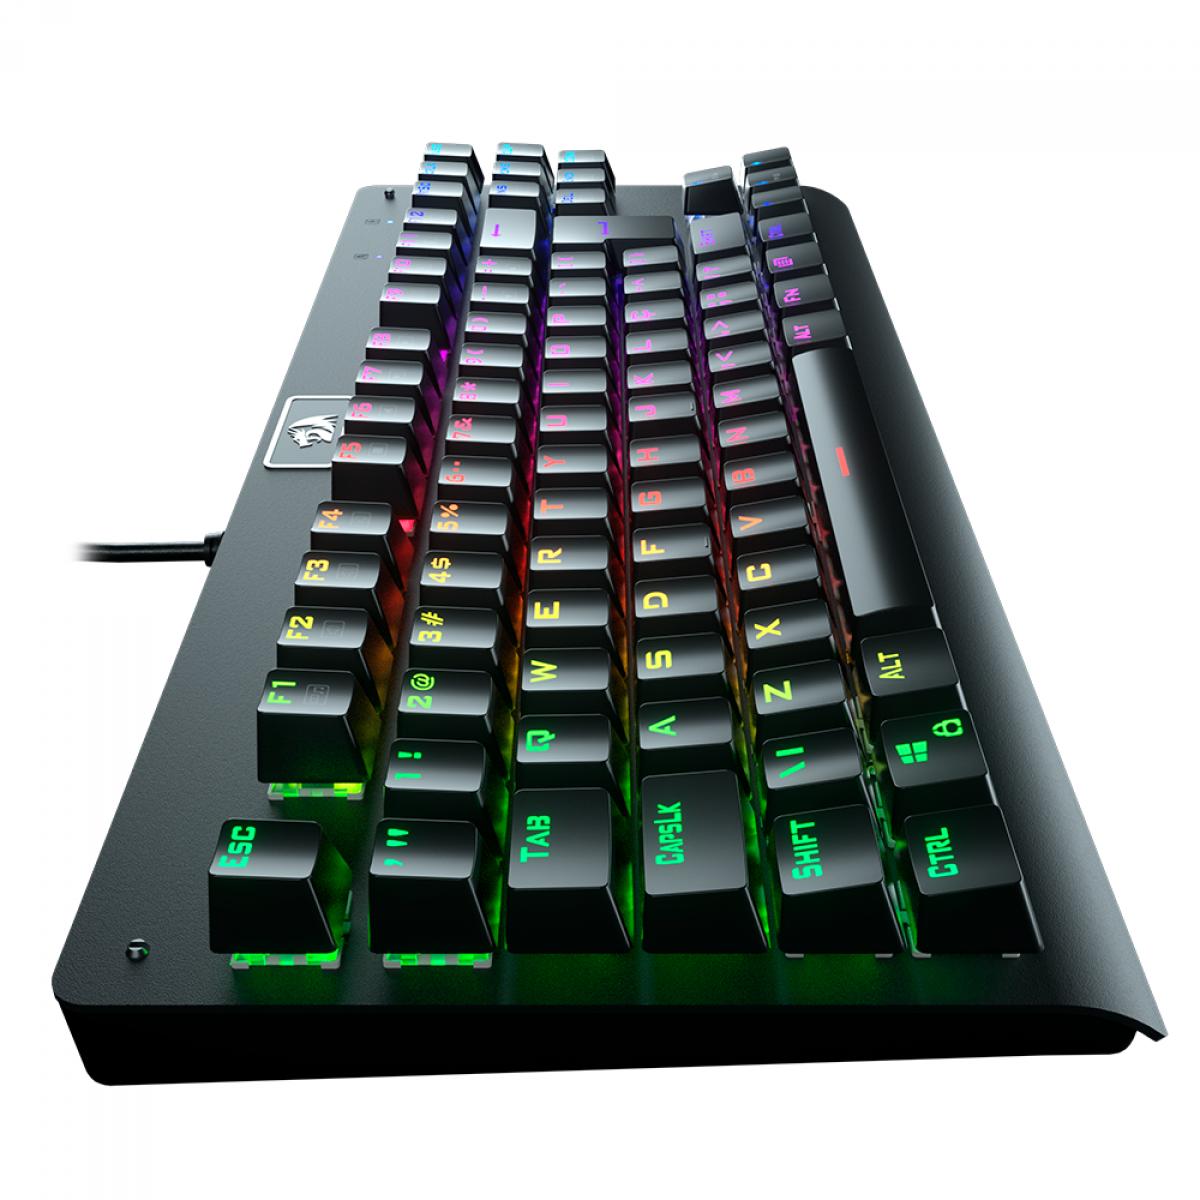 Teclado Mecânico Gamer Redragon Dark Avenger K568 RGB, Switch Outemu Black, ABNT2